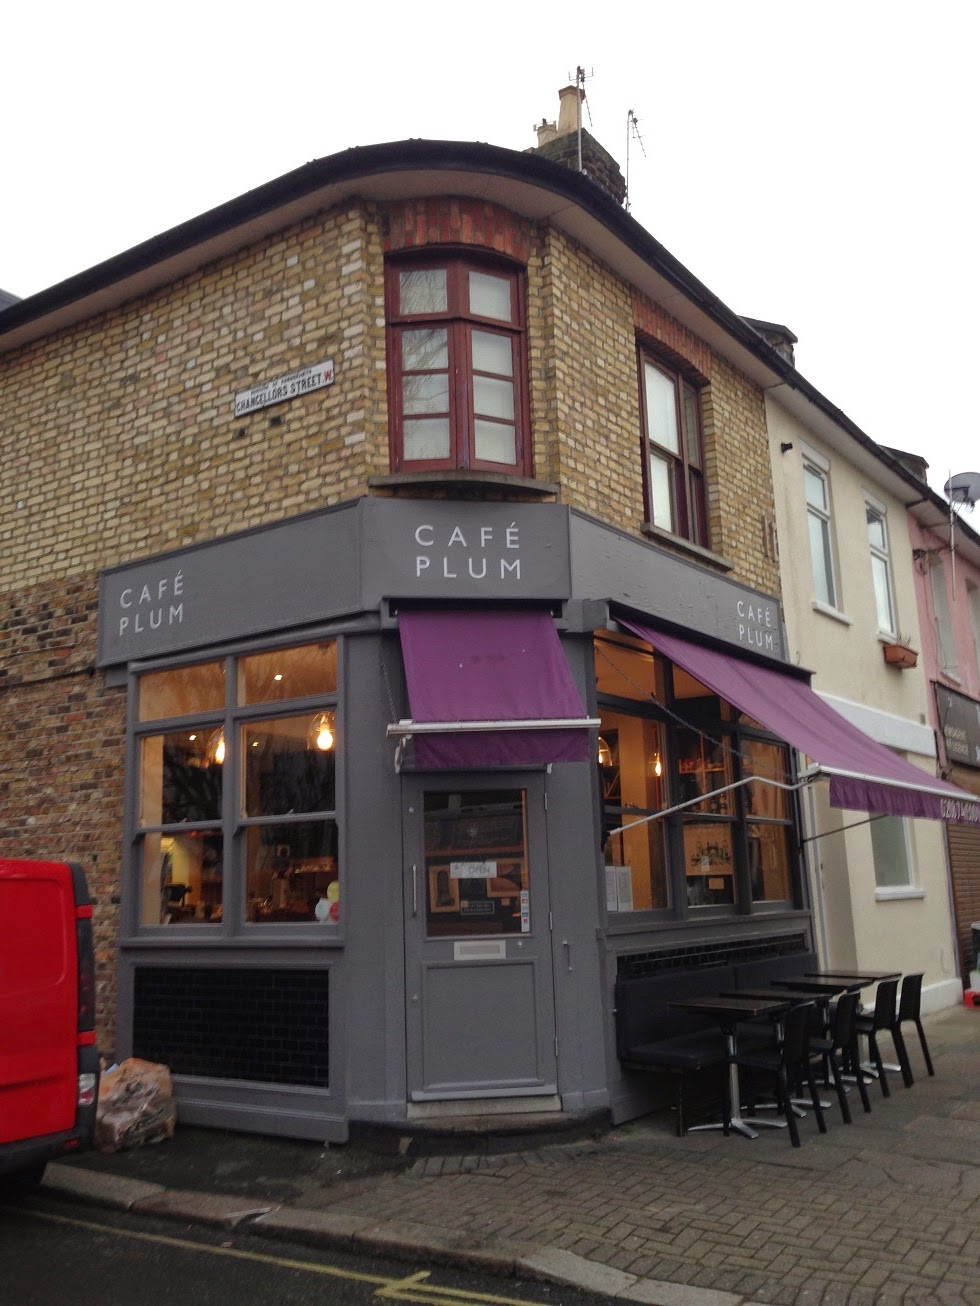 Café Plum, Chancellor's Street, Hammersmith, London